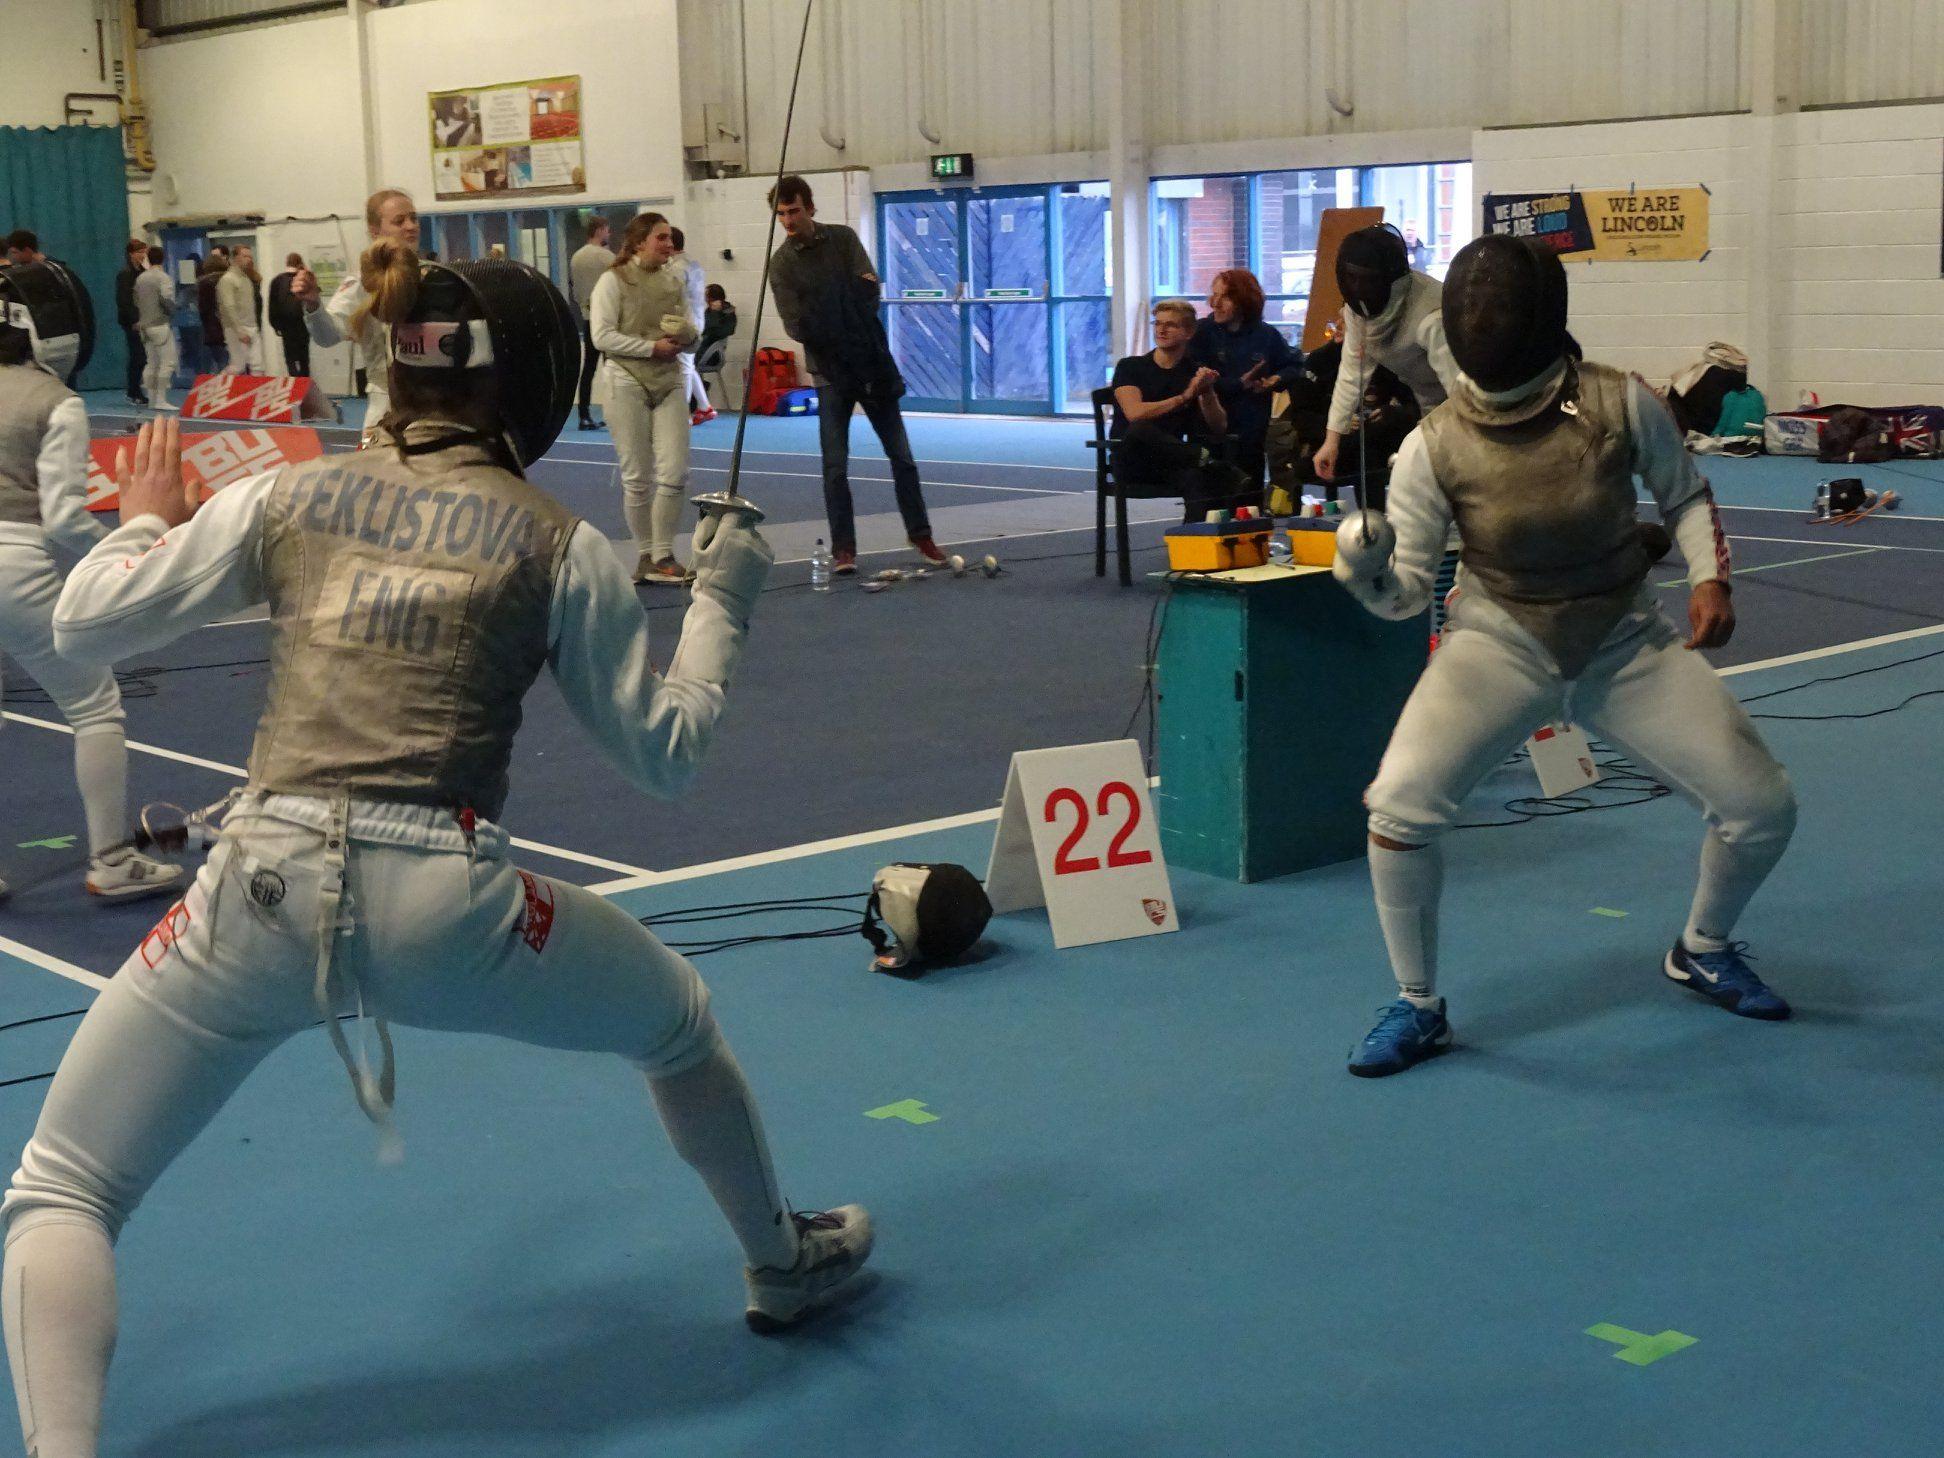 University of Warwick Fencing Club